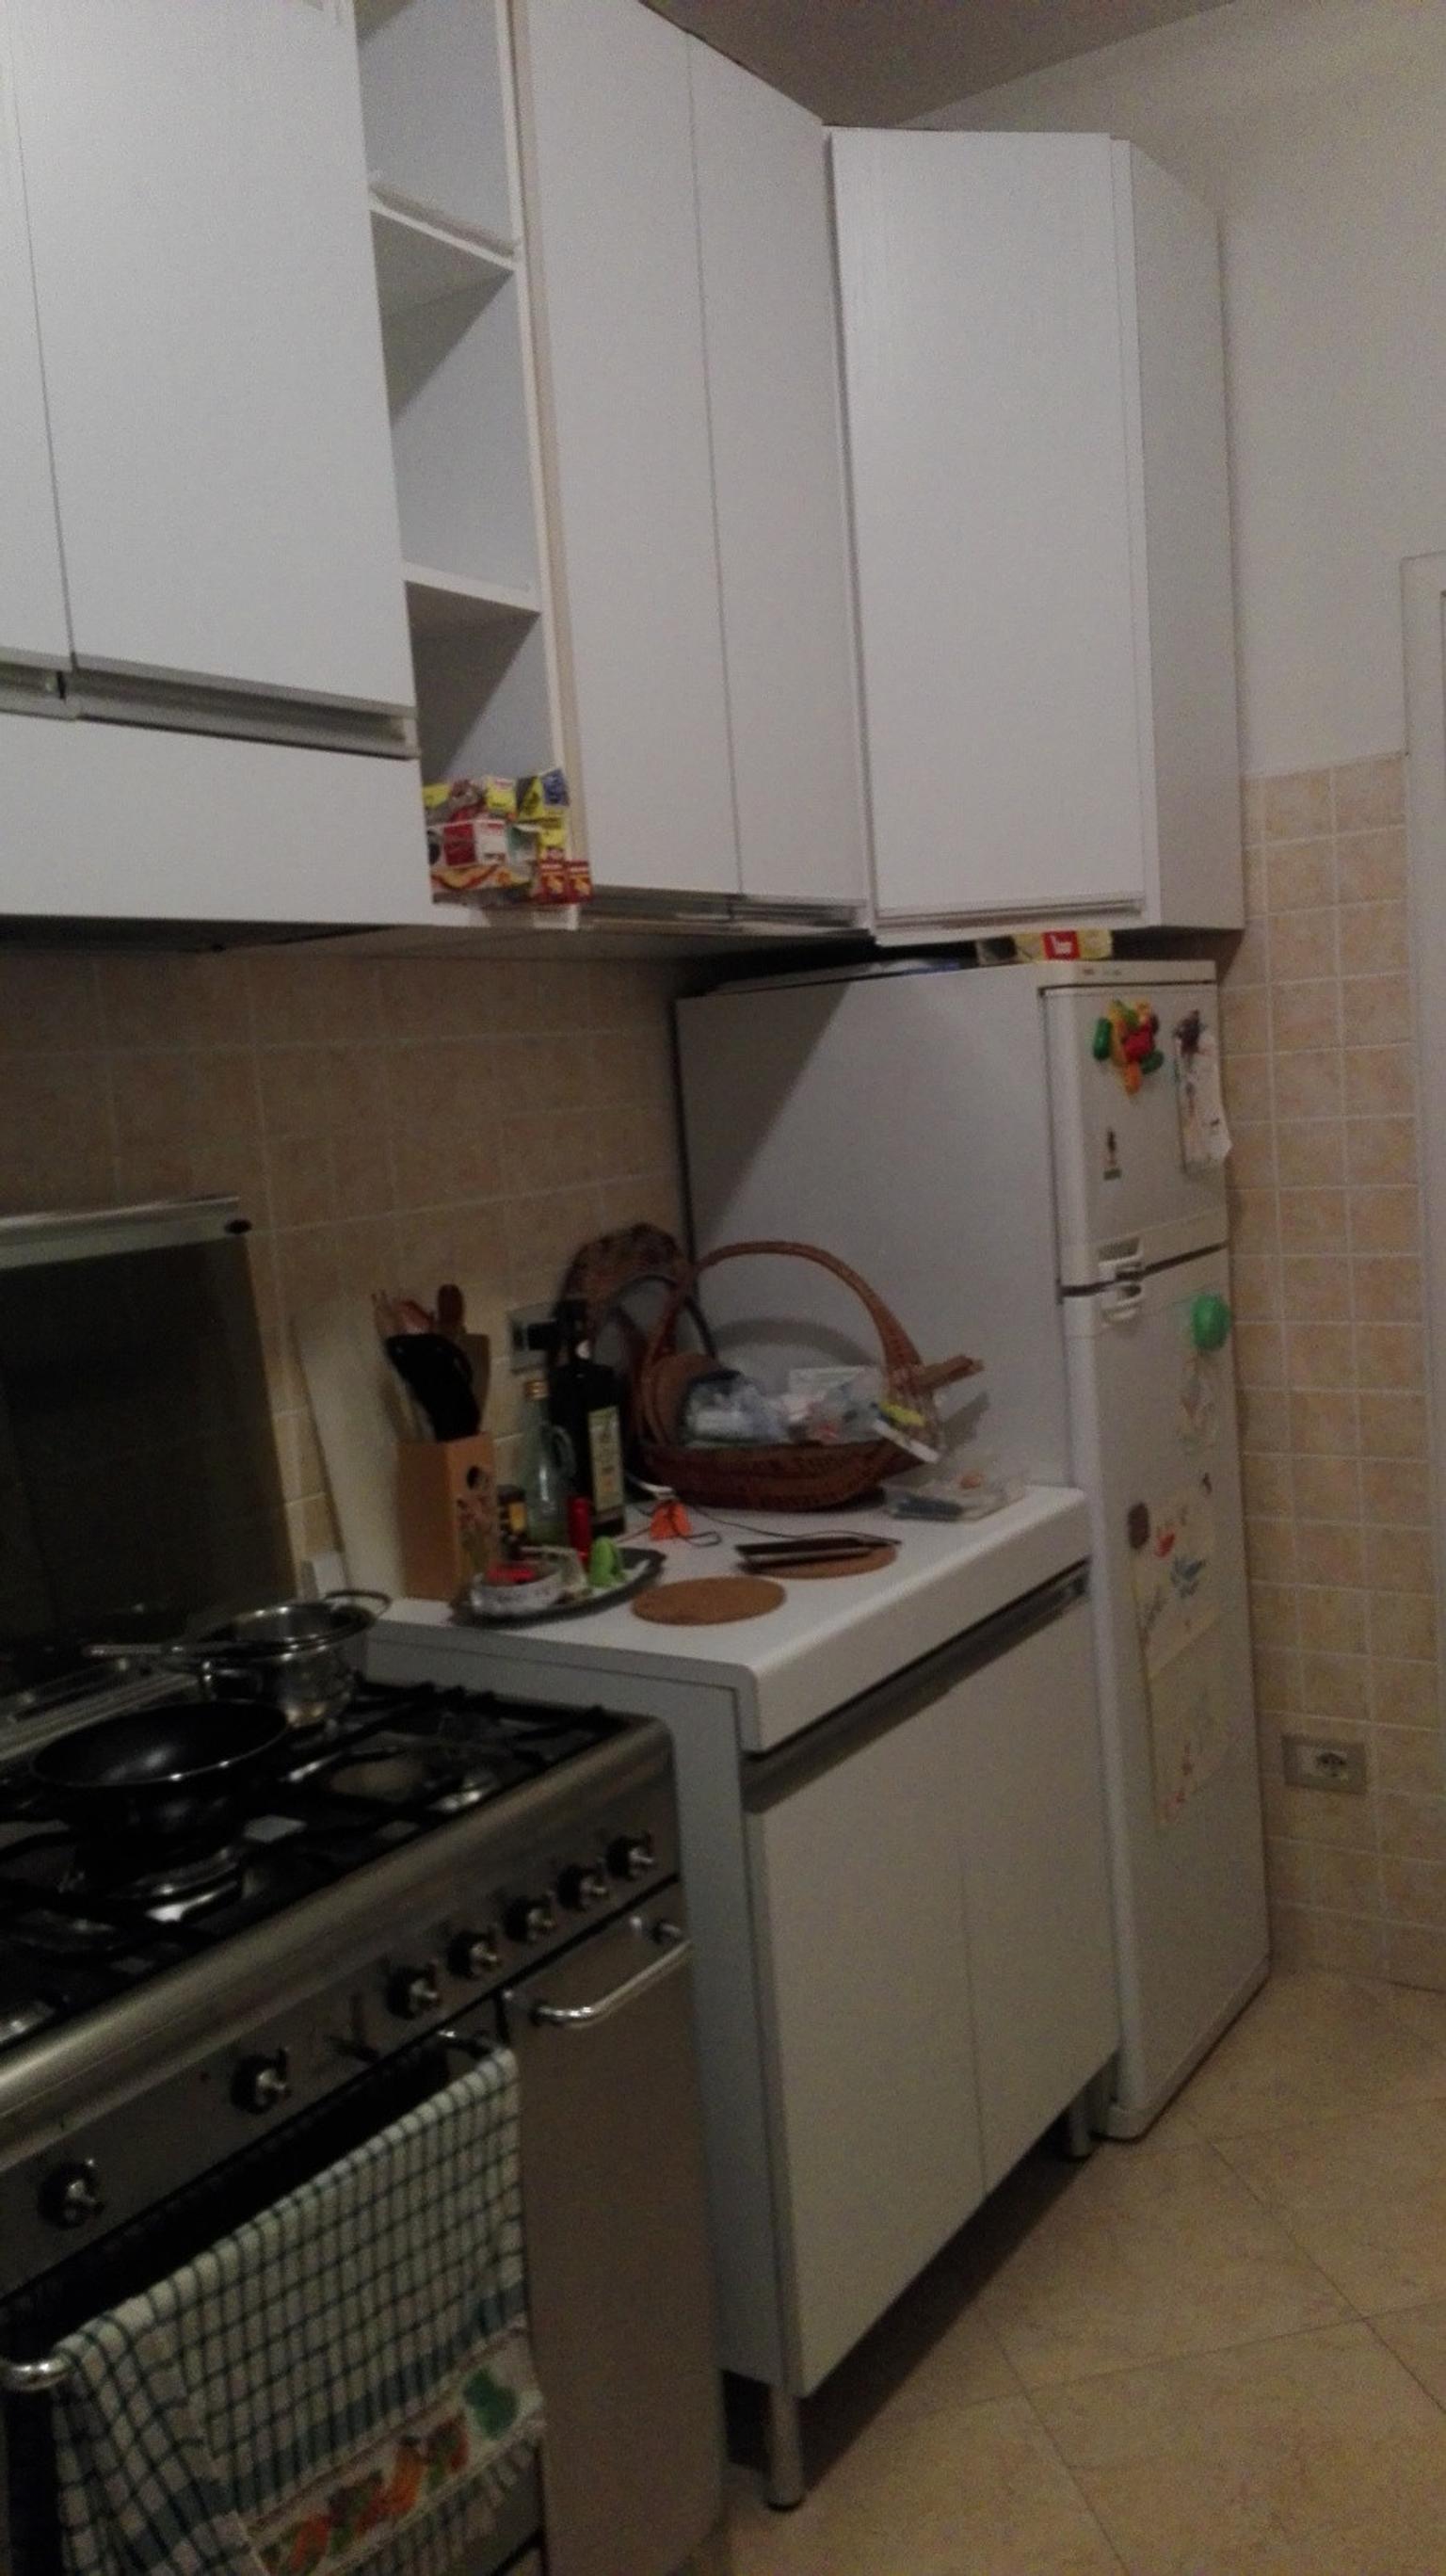 (co) in via pisacane, 21. Cucine Usate In Regalo